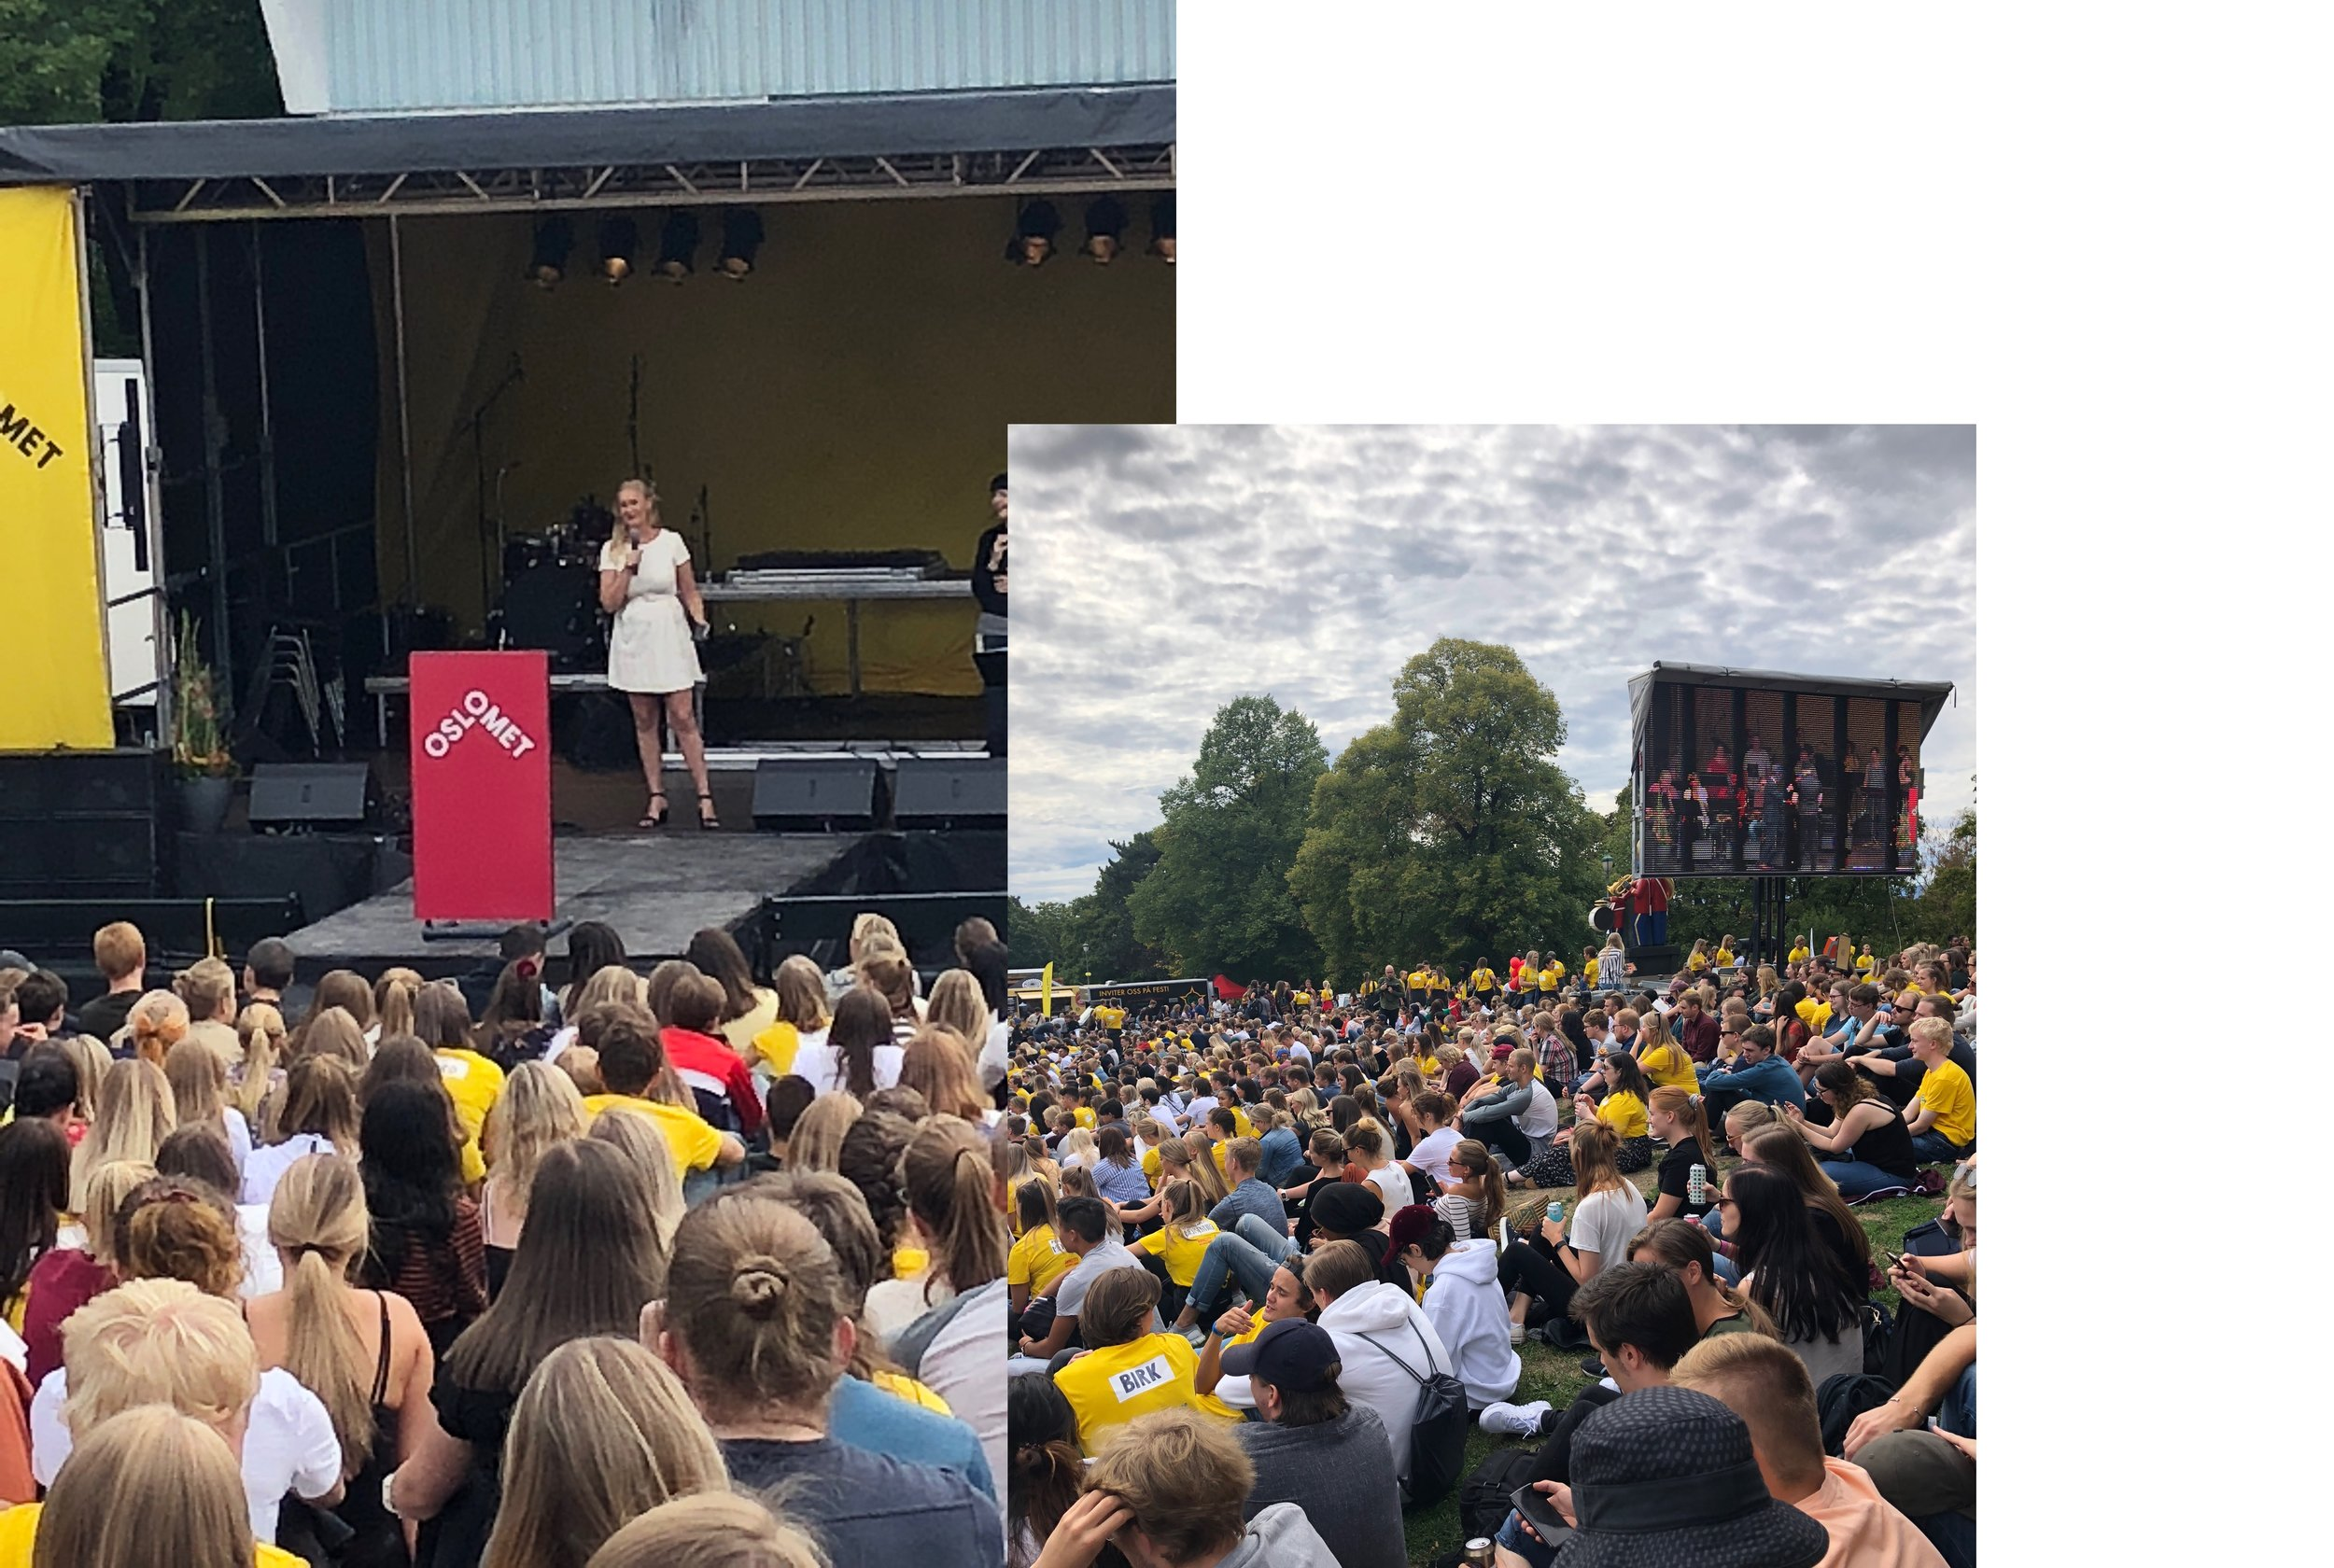 OsloMET 2018 - Sofie Frøysaa som konferansier på OsloMET 2018